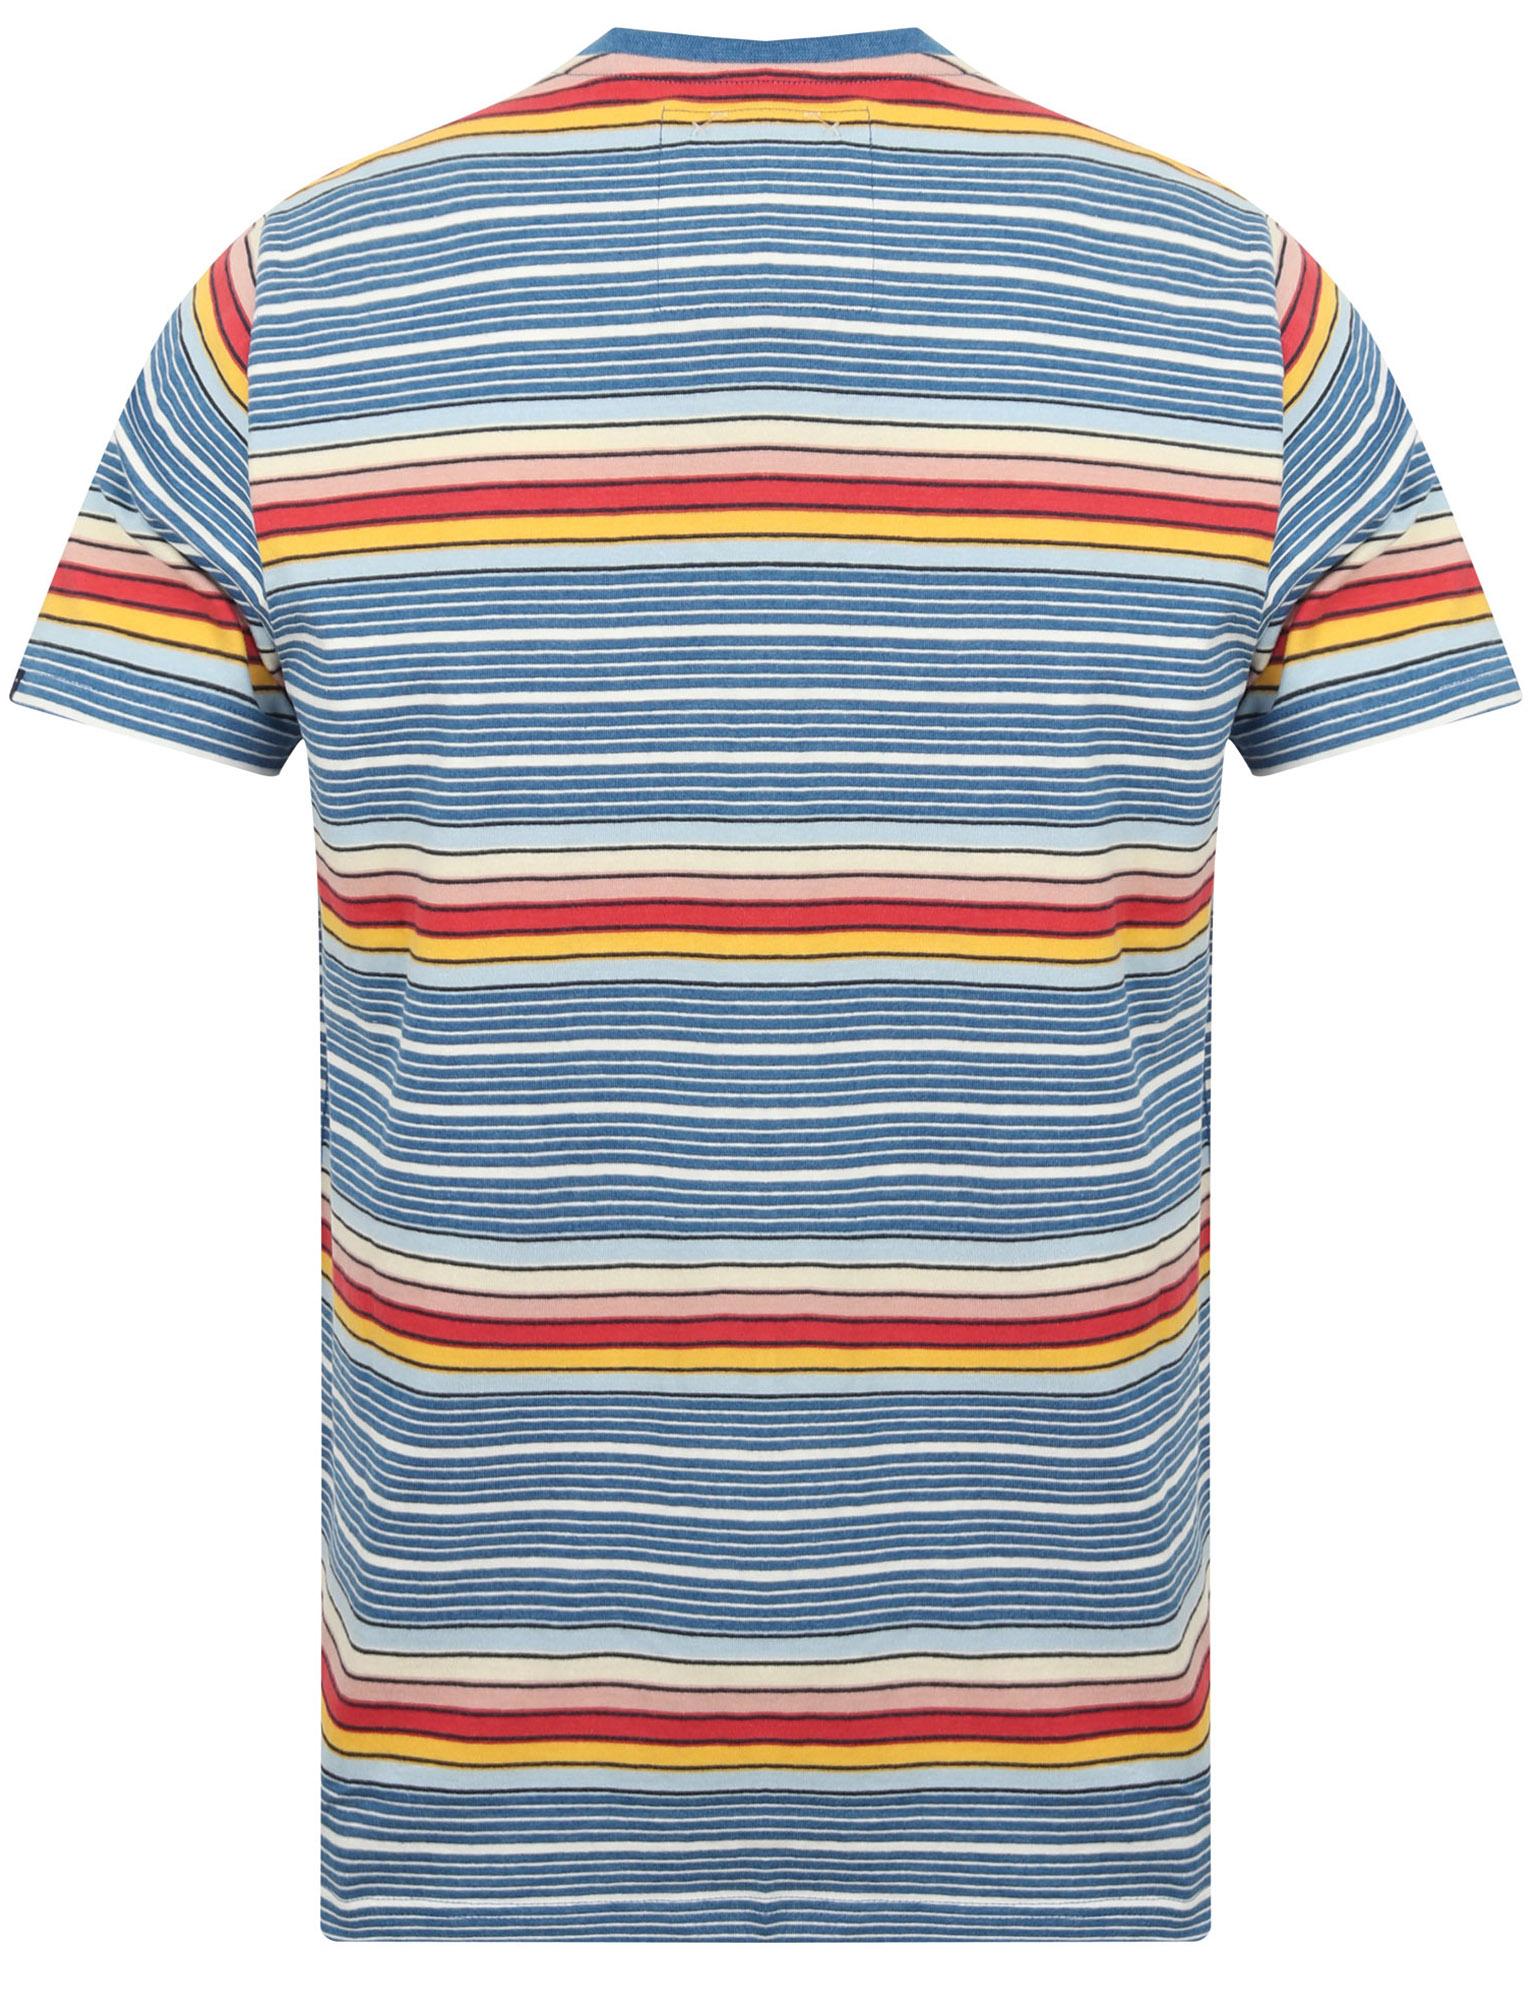 Tokyo-Laundry-Men-039-s-Lowell-Crew-Neck-Striped-T-Shirt-Stripy-Retro-Rainbow-Top thumbnail 3